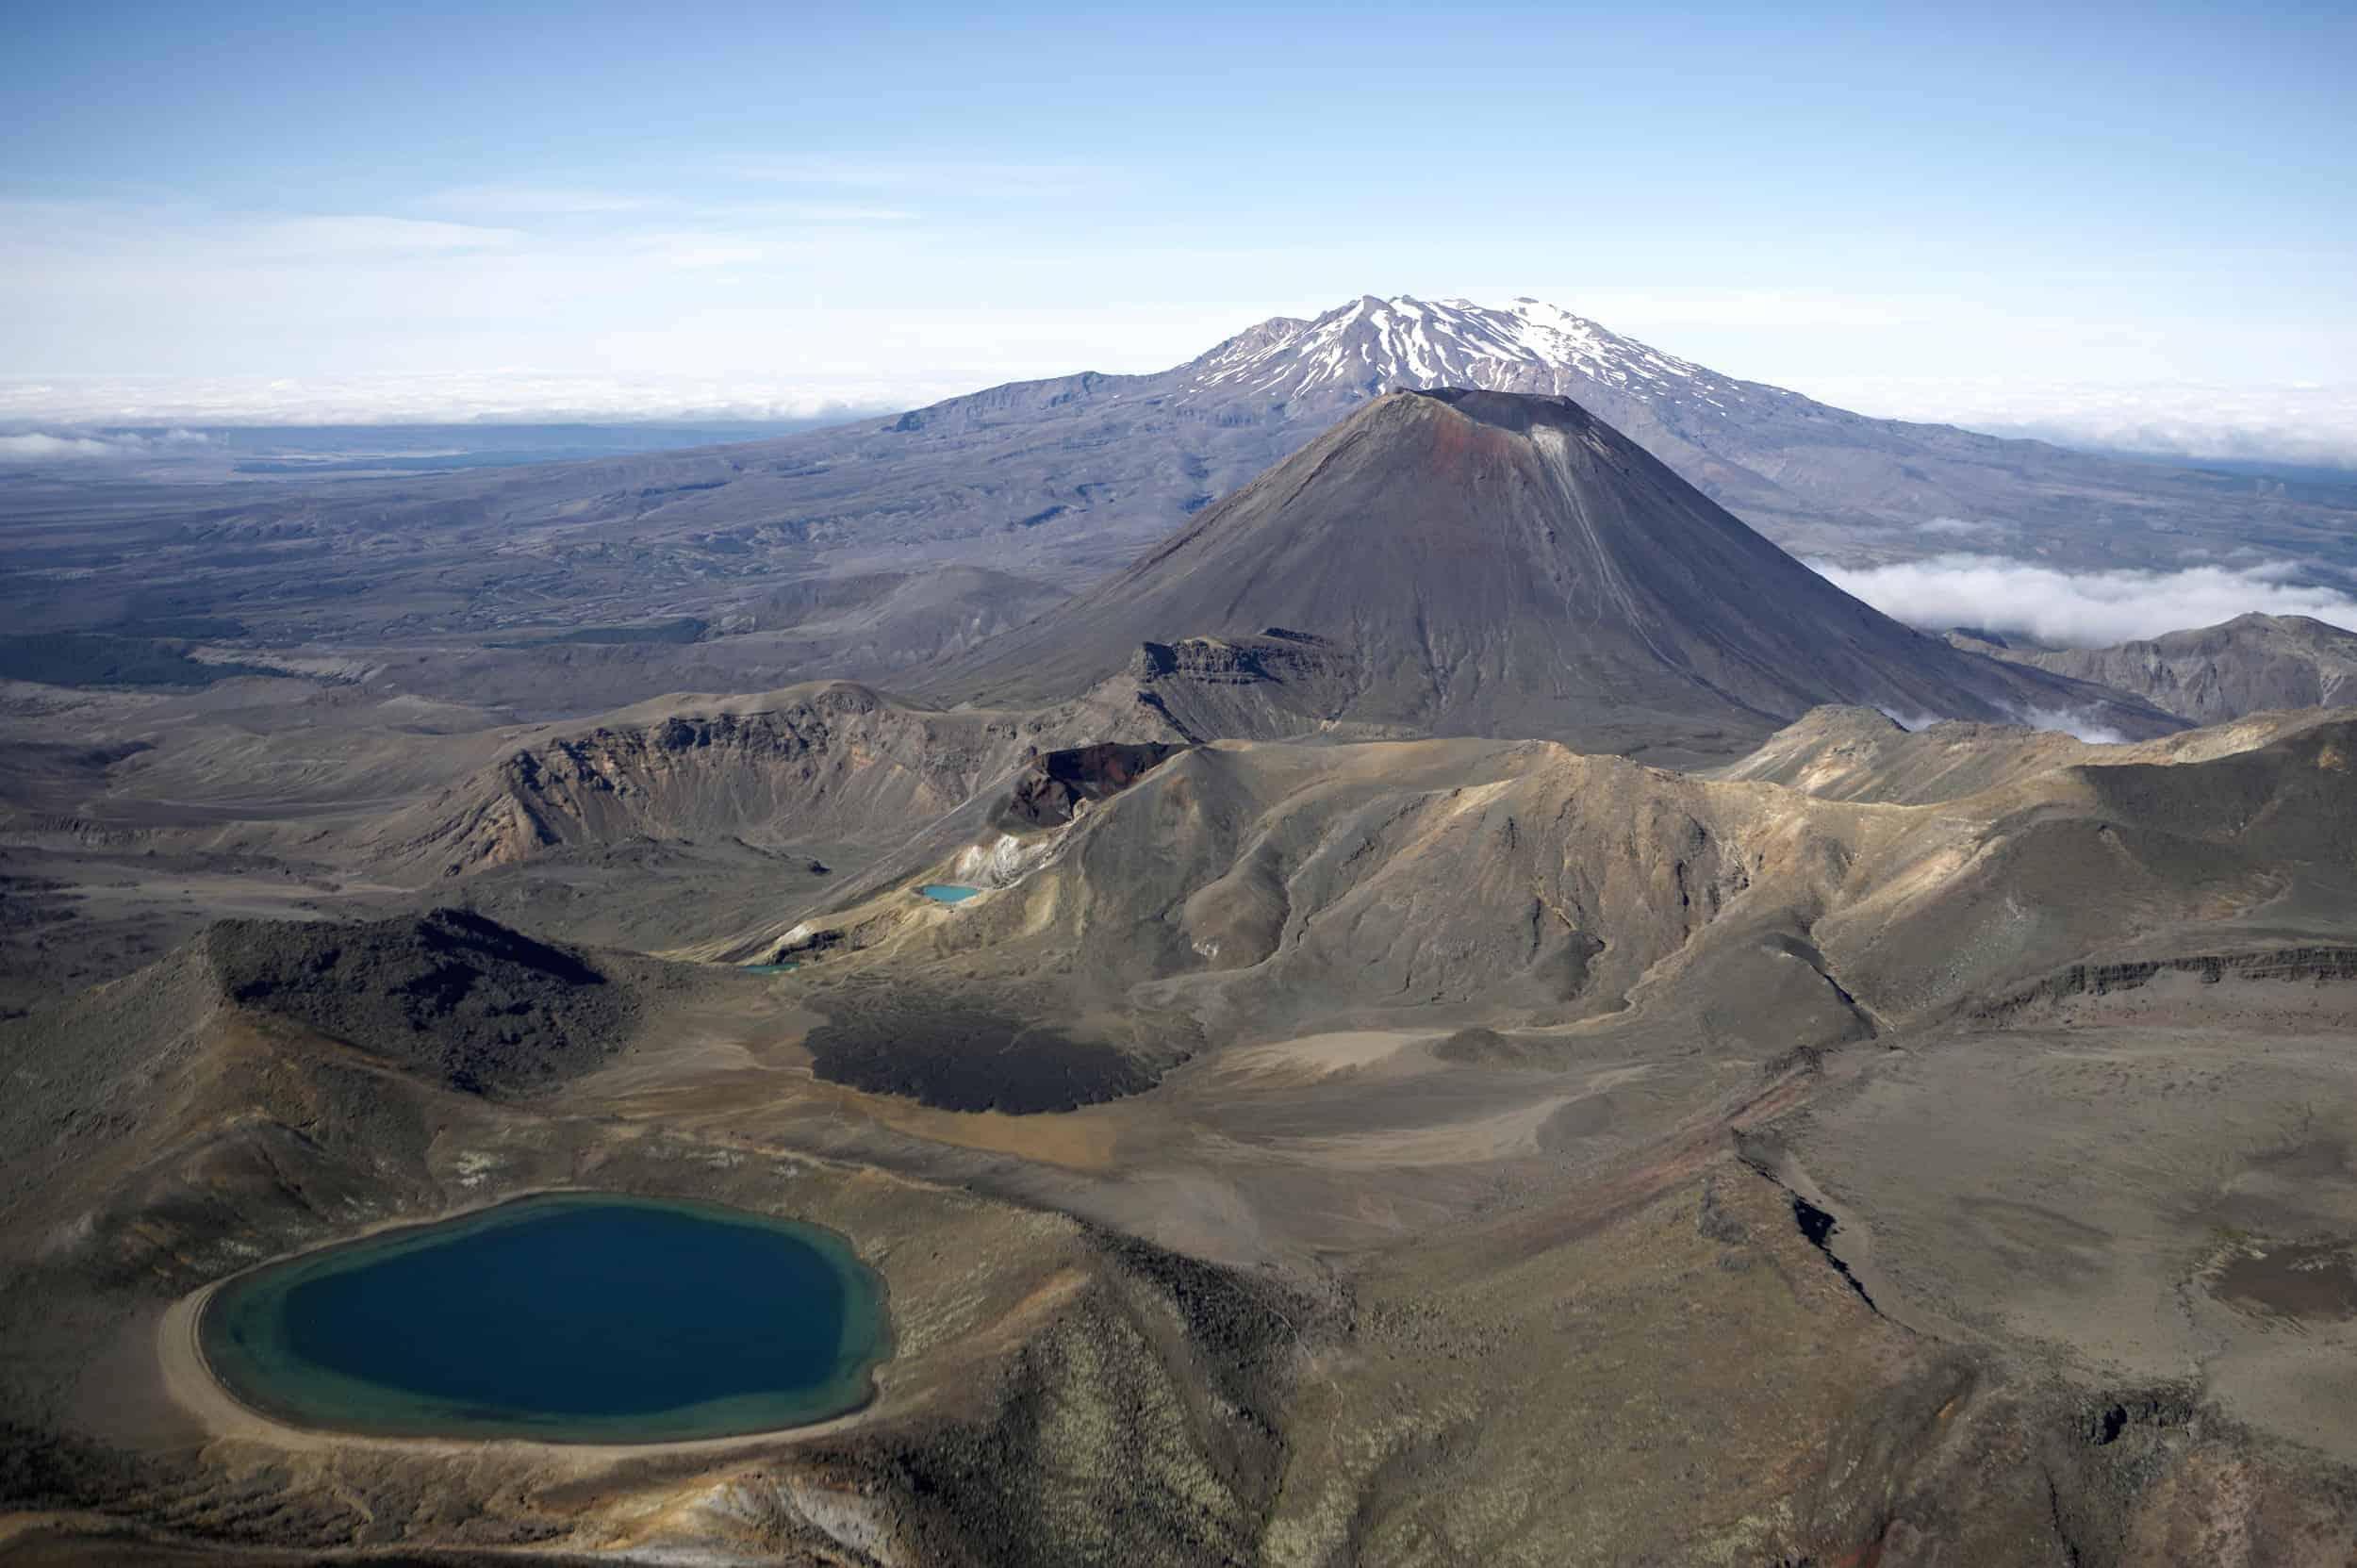 https://i1.wp.com/www.explorecentralnorthislandnz.com/wp-content/gallery/ruapehu/tongariro-national-park.jpg